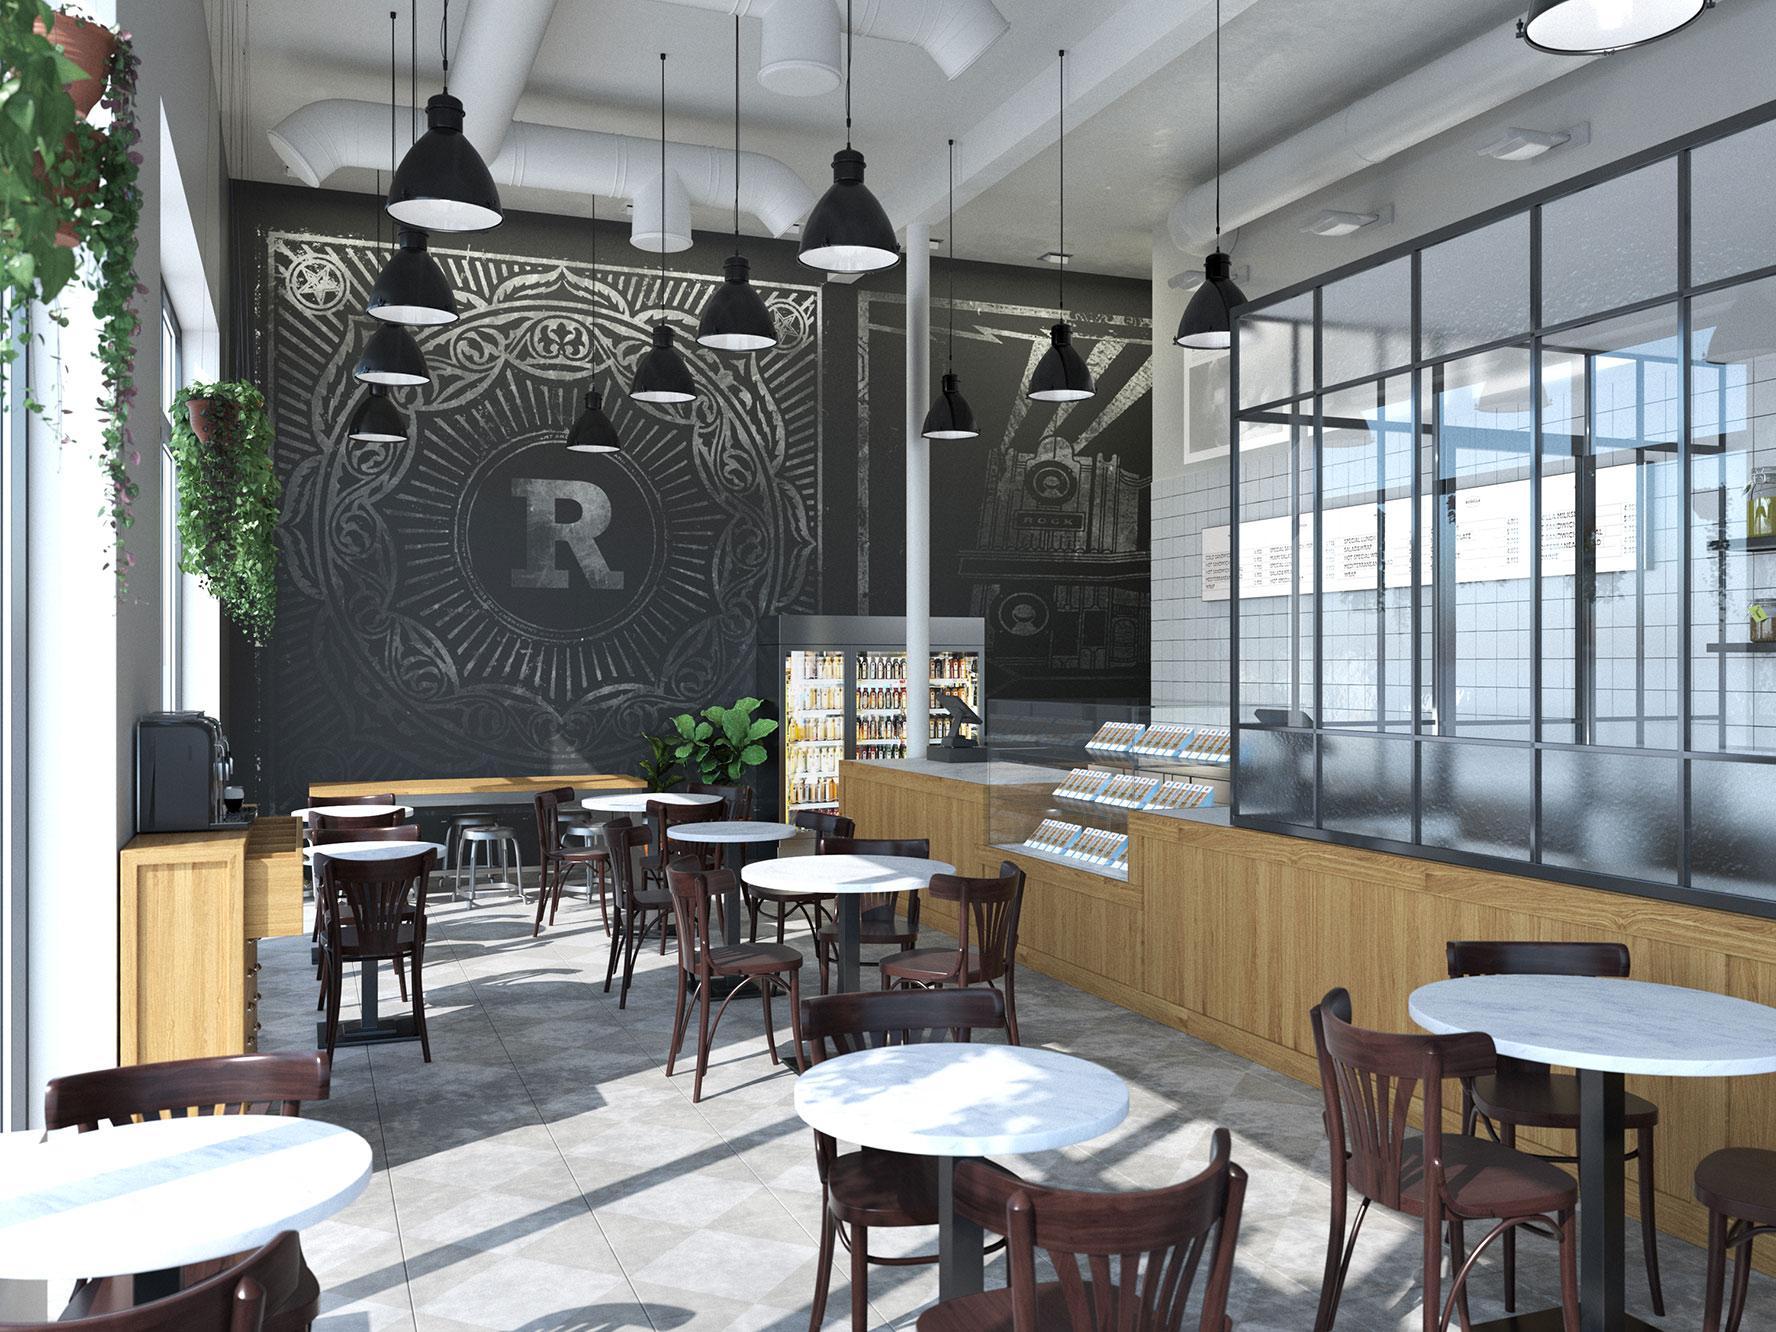 Rodilla Wynwood | Interioristas Hospitality | MOEM Studio